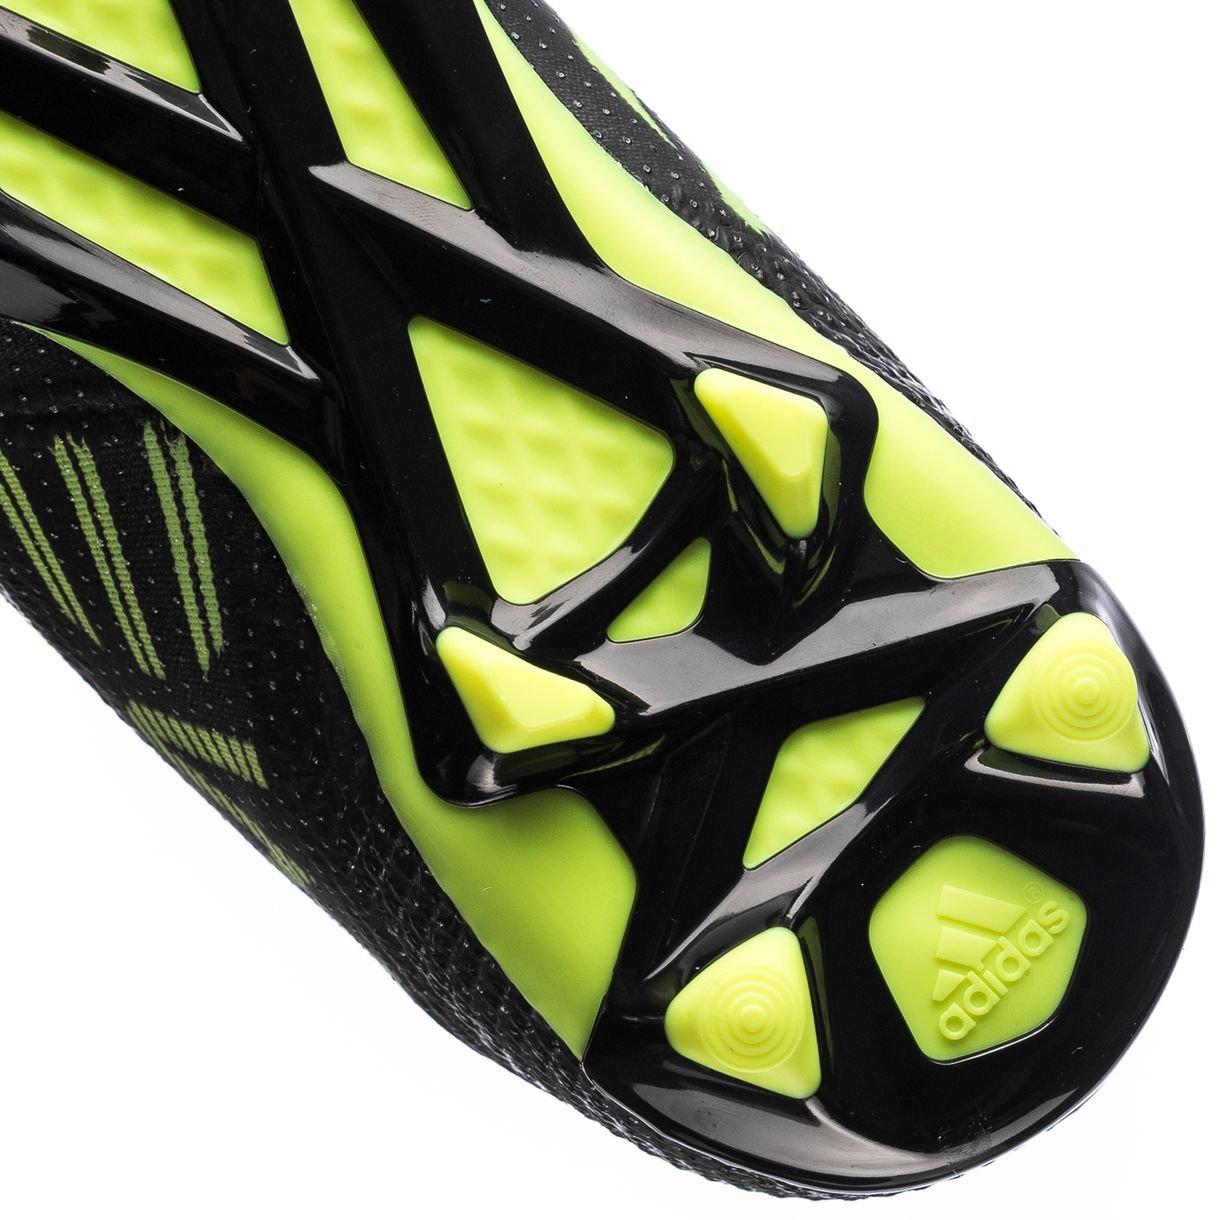 Football shoes adidas NEMEZIZ MESSI 17.1 FG J